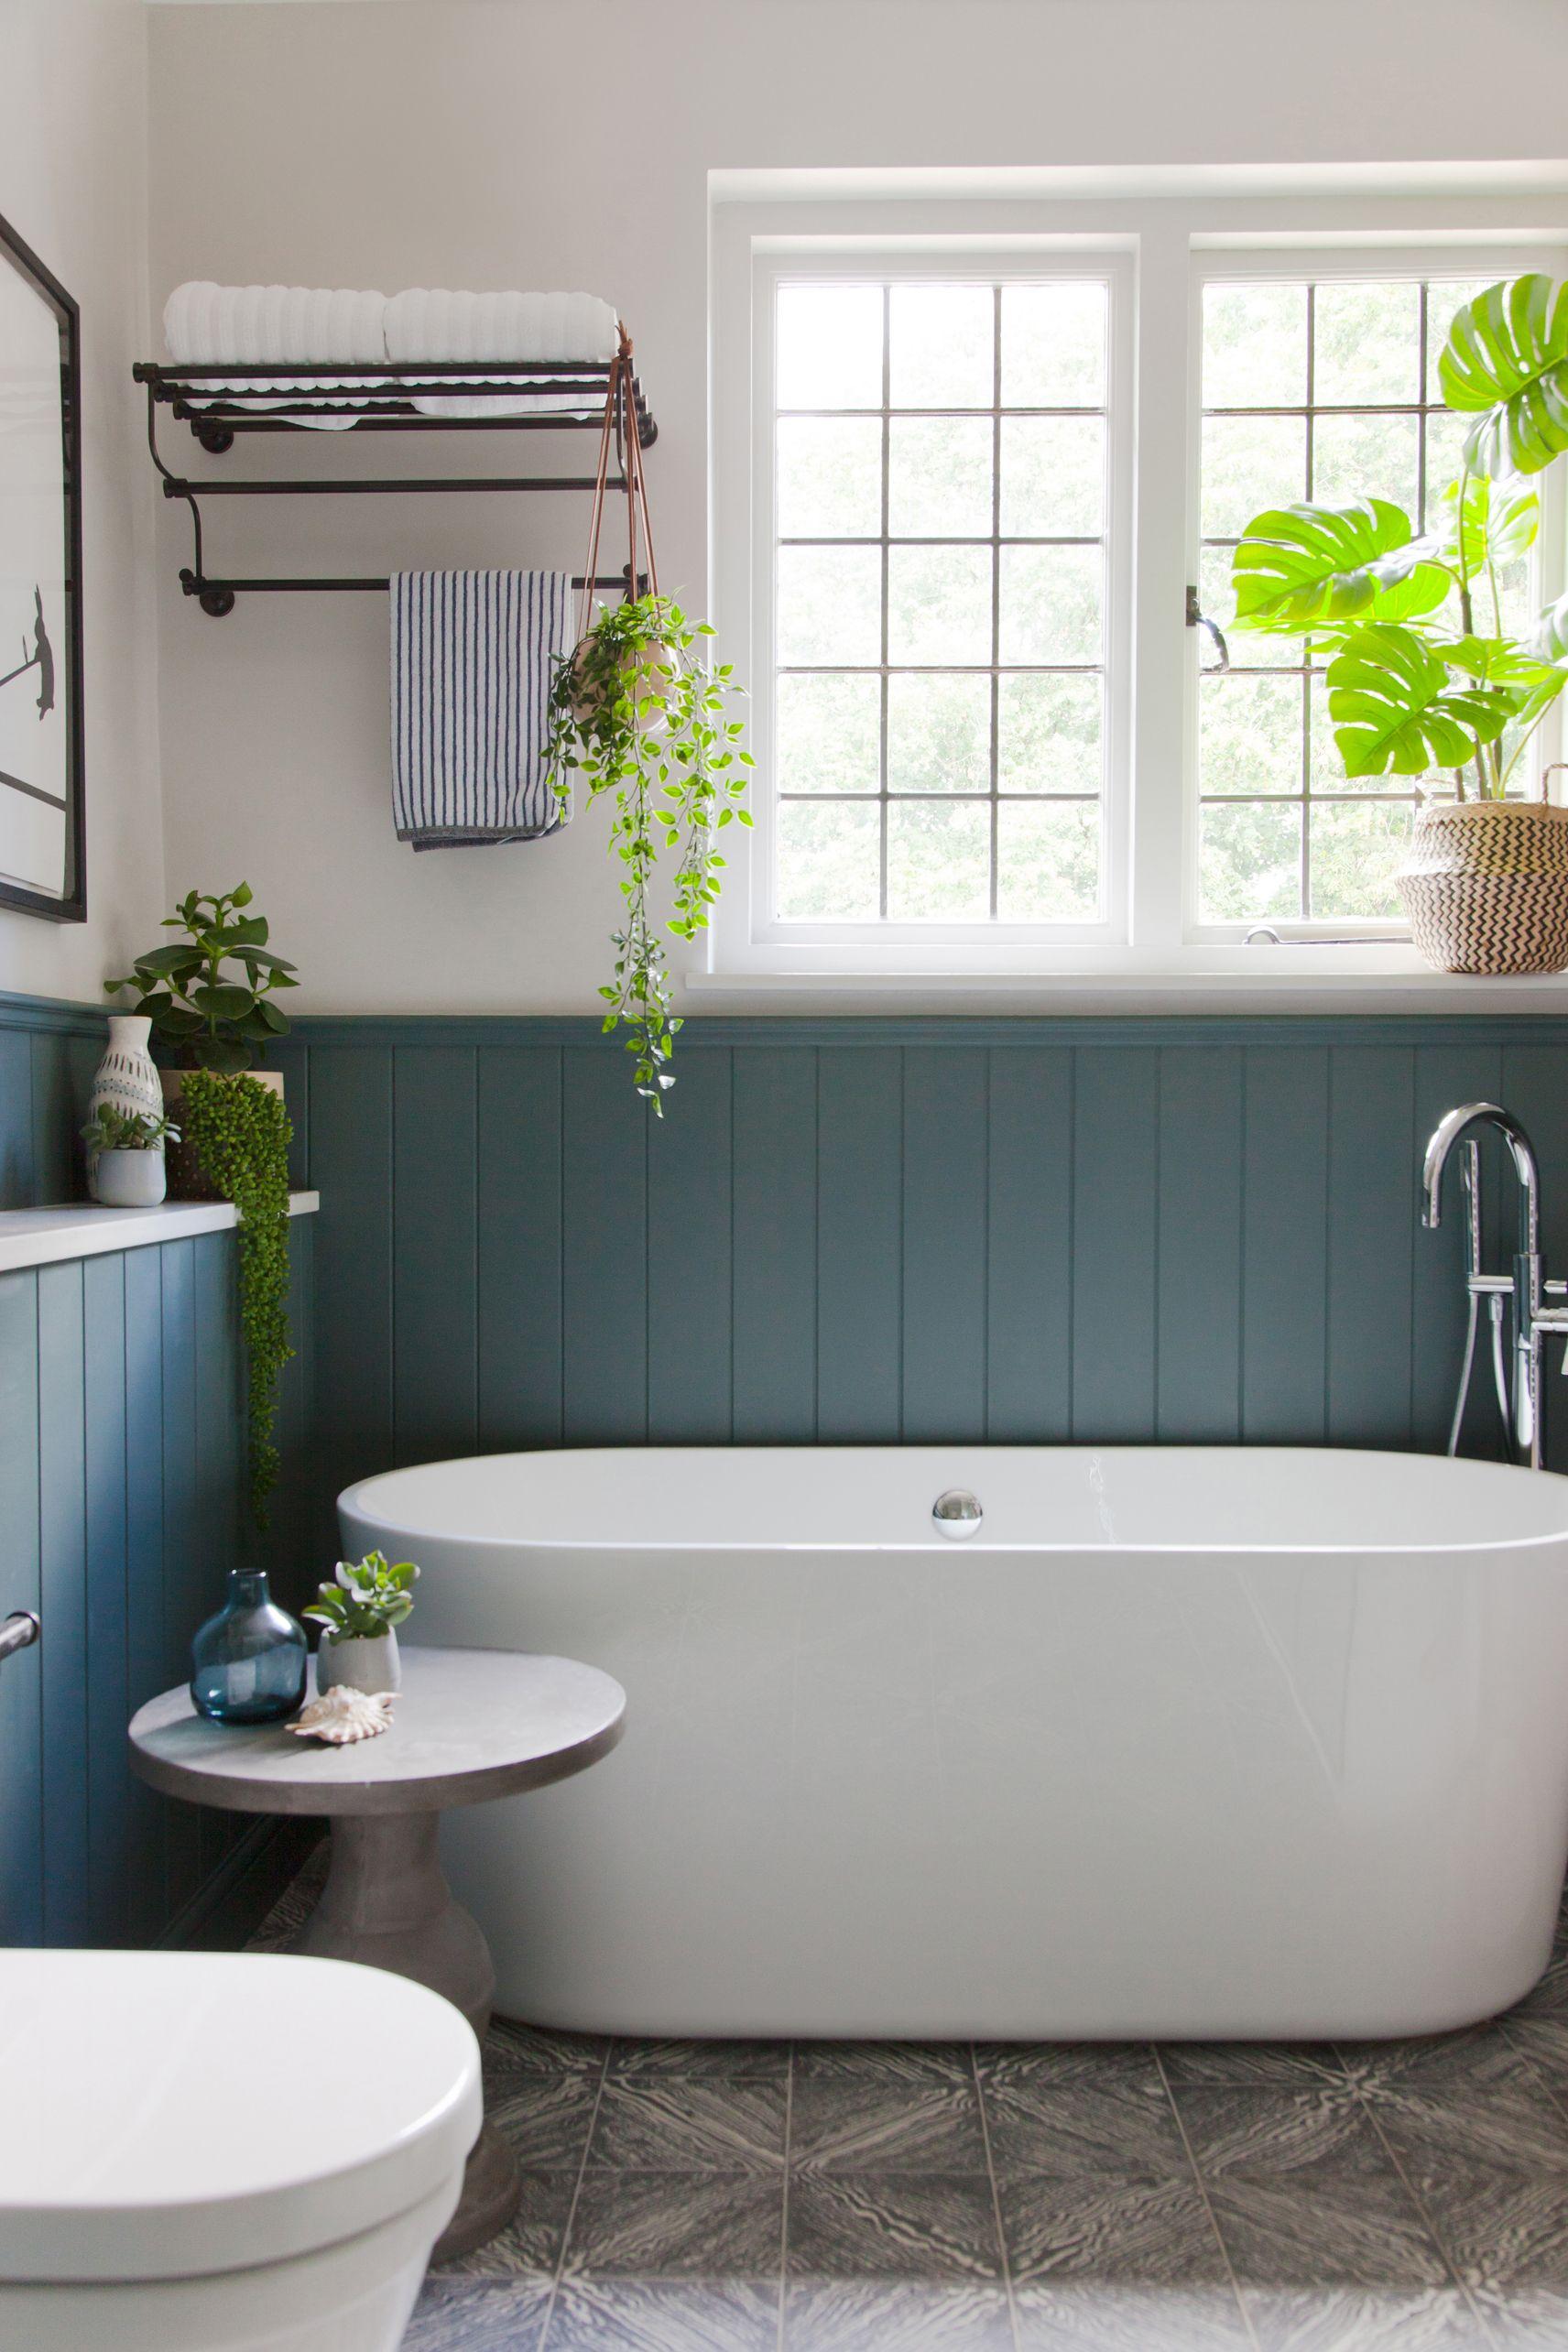 20 Best Bathroom Storage Ideas In 2019 Creative Bathroom with regard to dimensions 1712 X 2568